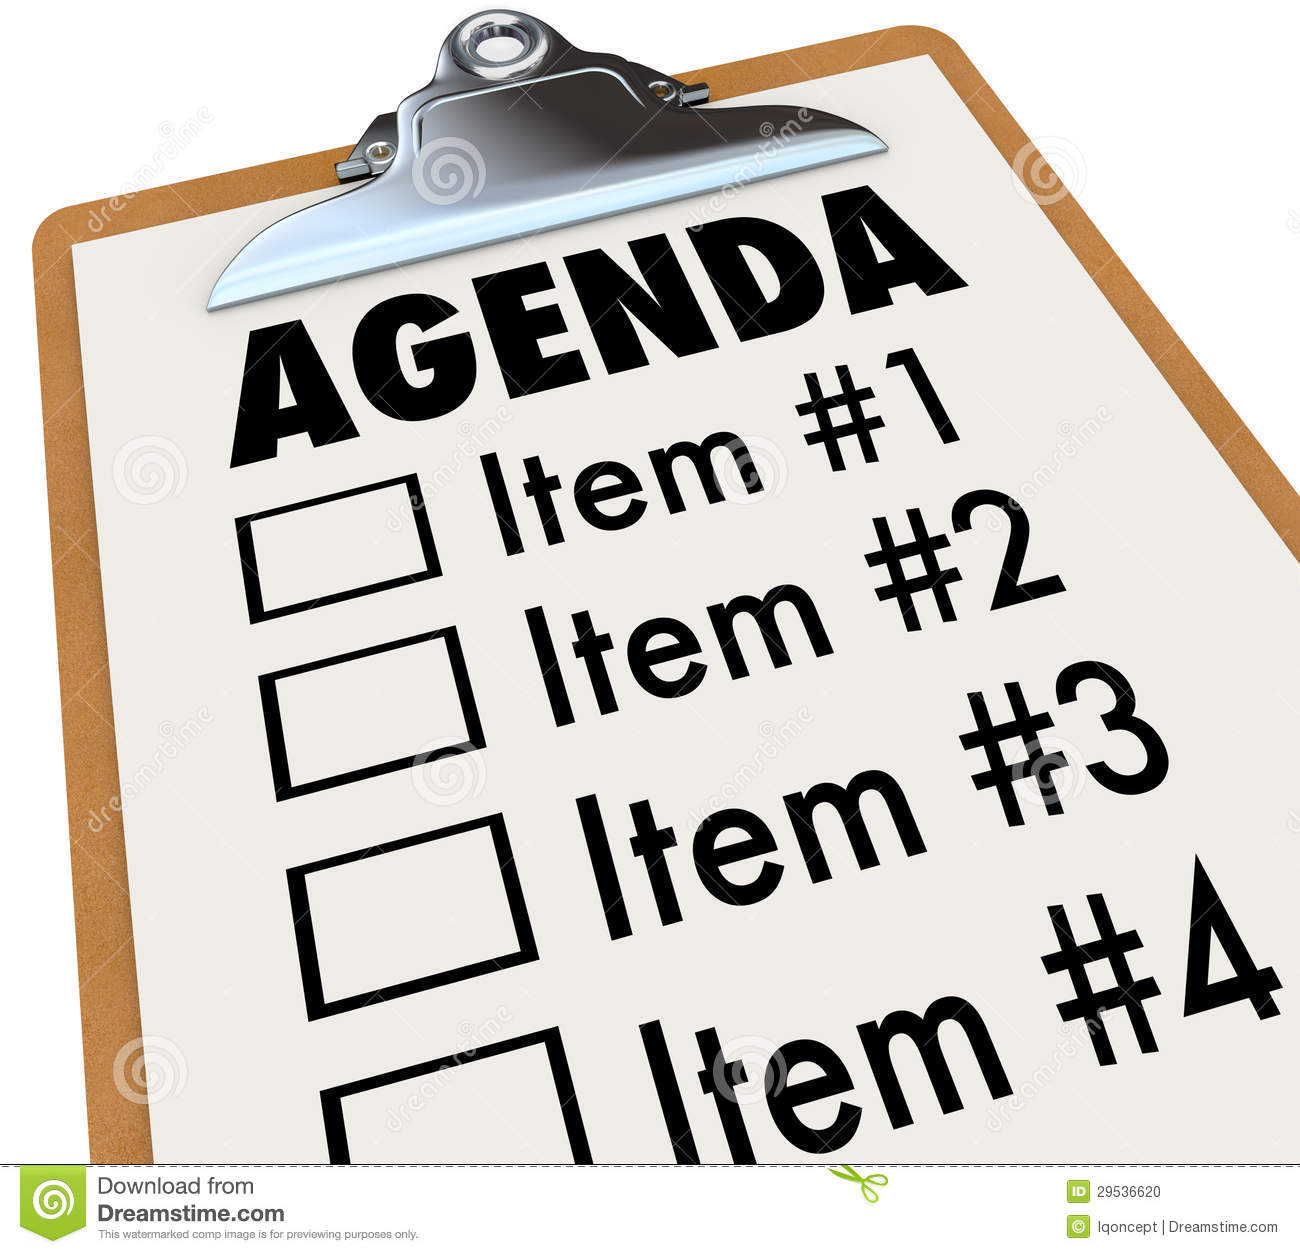 Agenda clipart. Clip art free panda